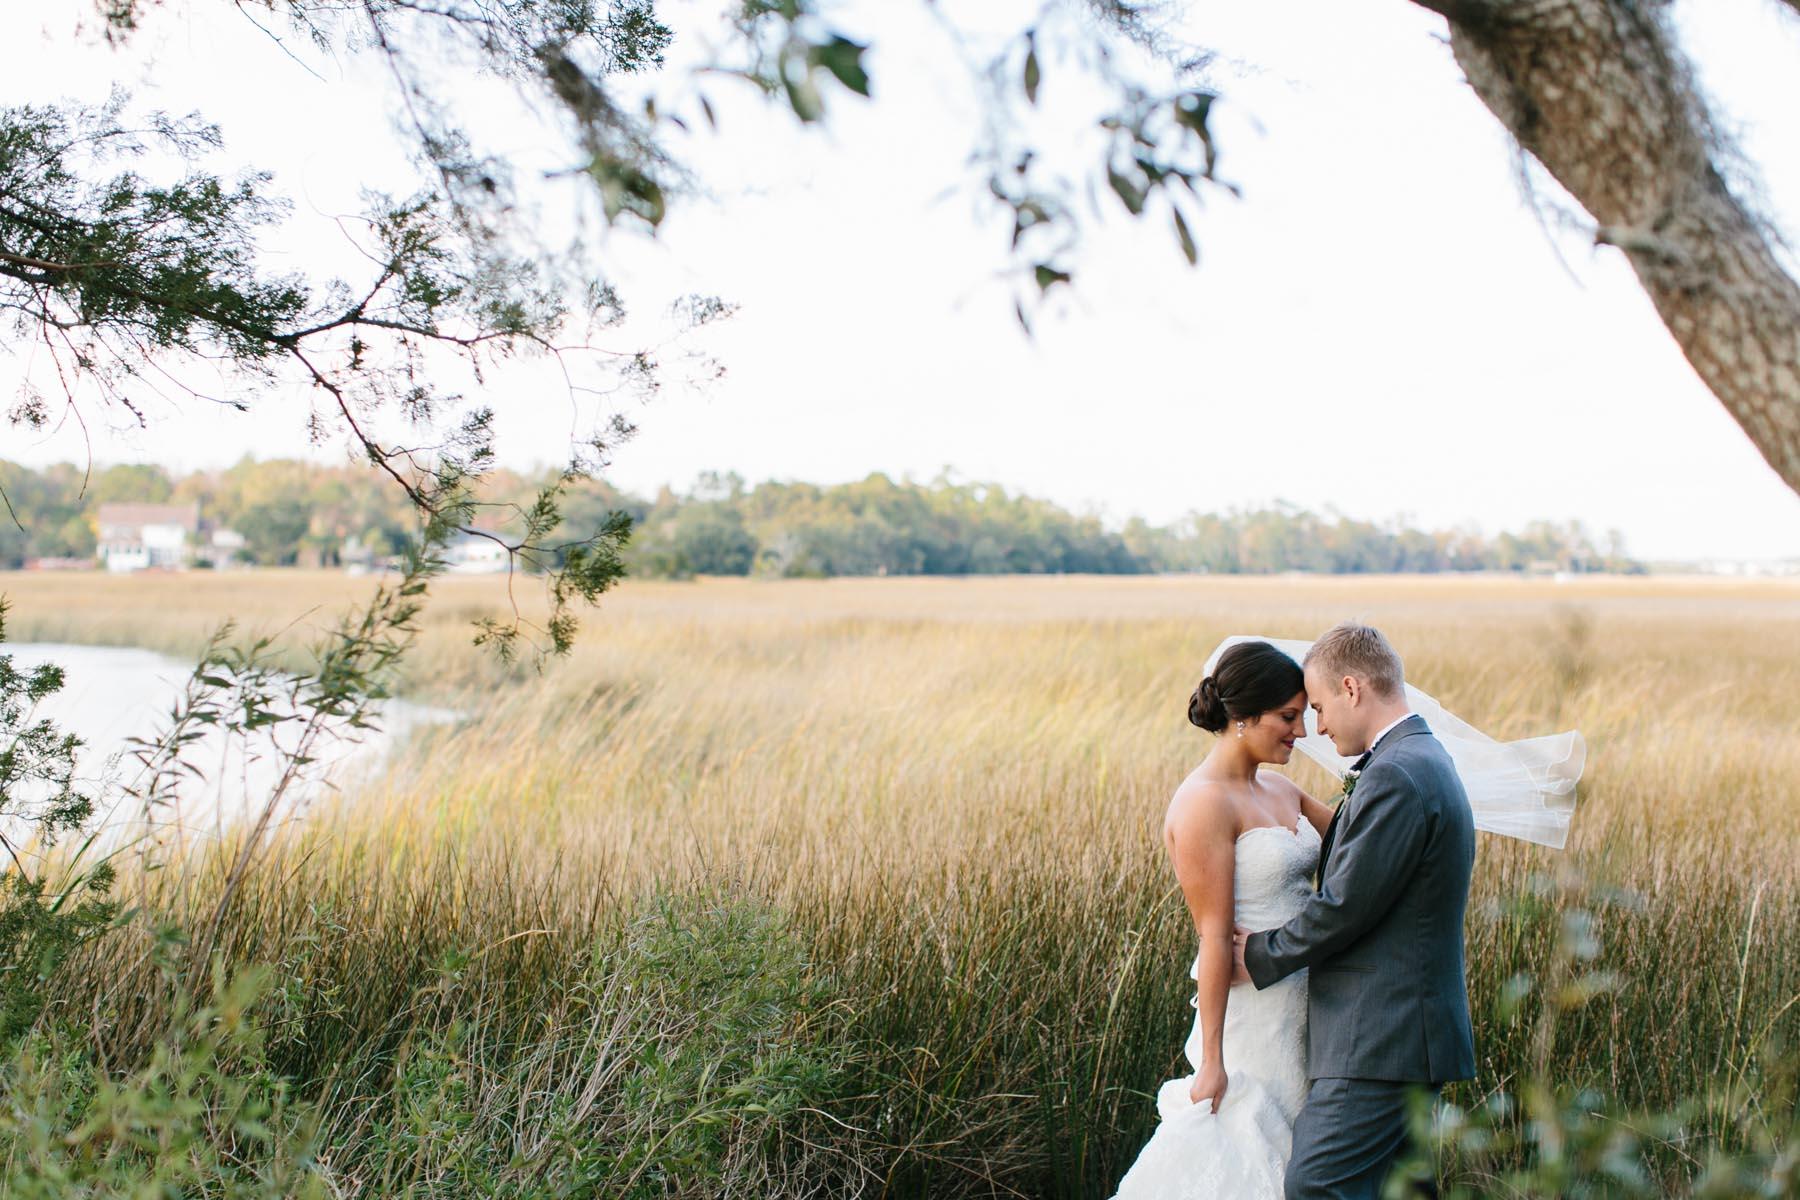 stefan wedding blog-40